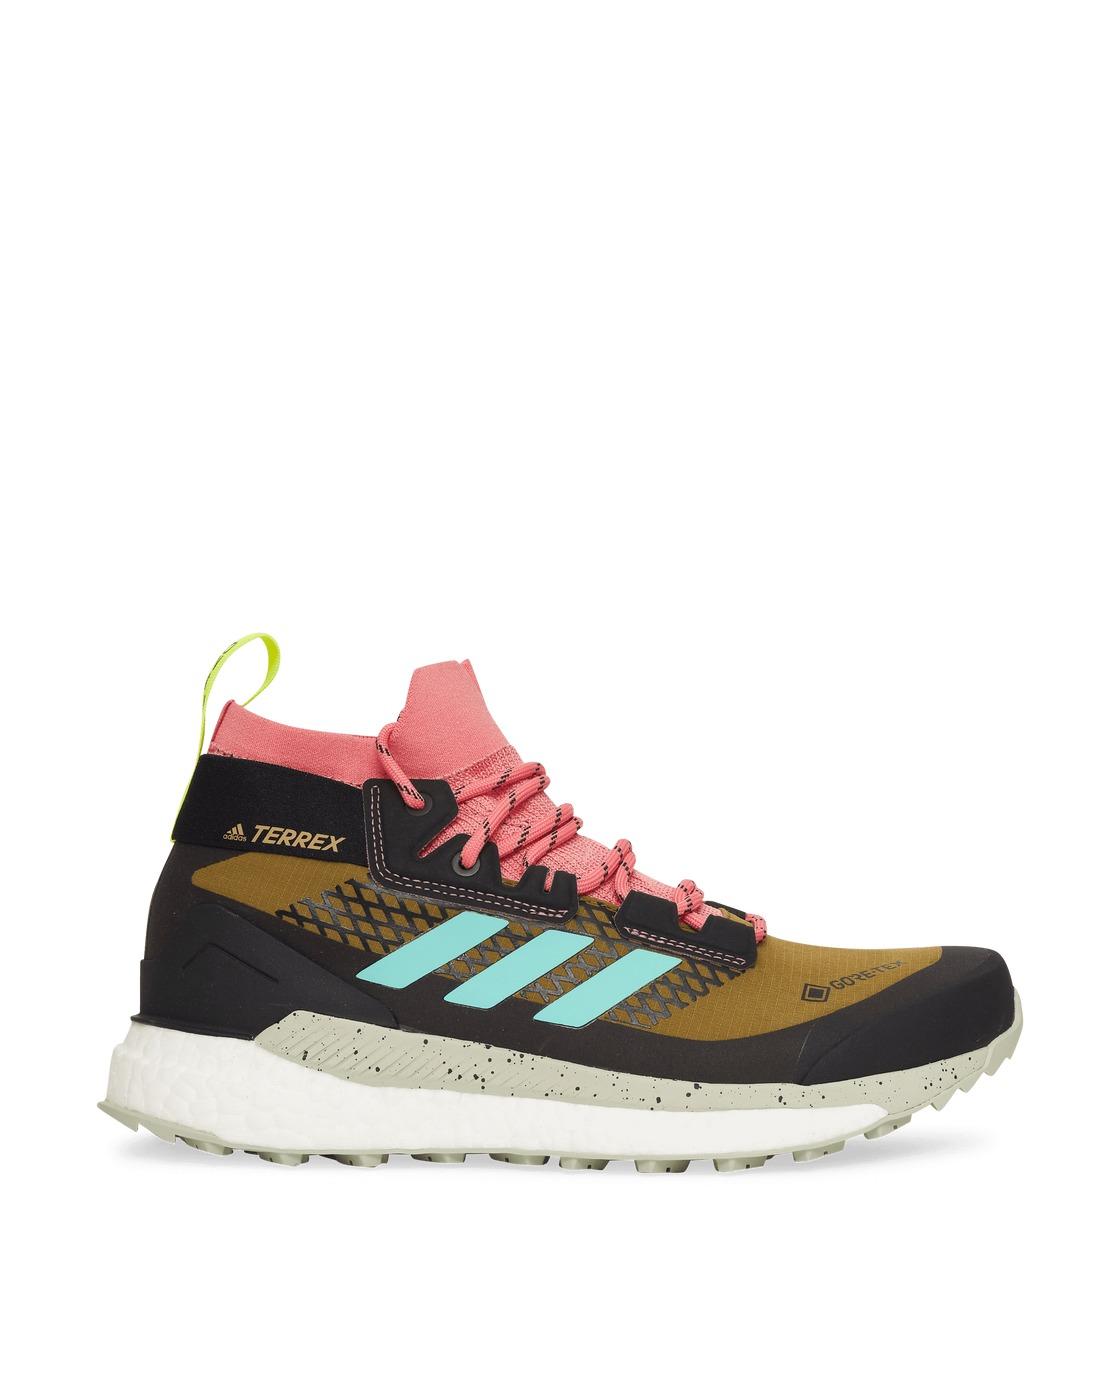 Adidas Originals Terrex Free Hiker Gore Tex Sneakers Wild Moss/Acid Mint